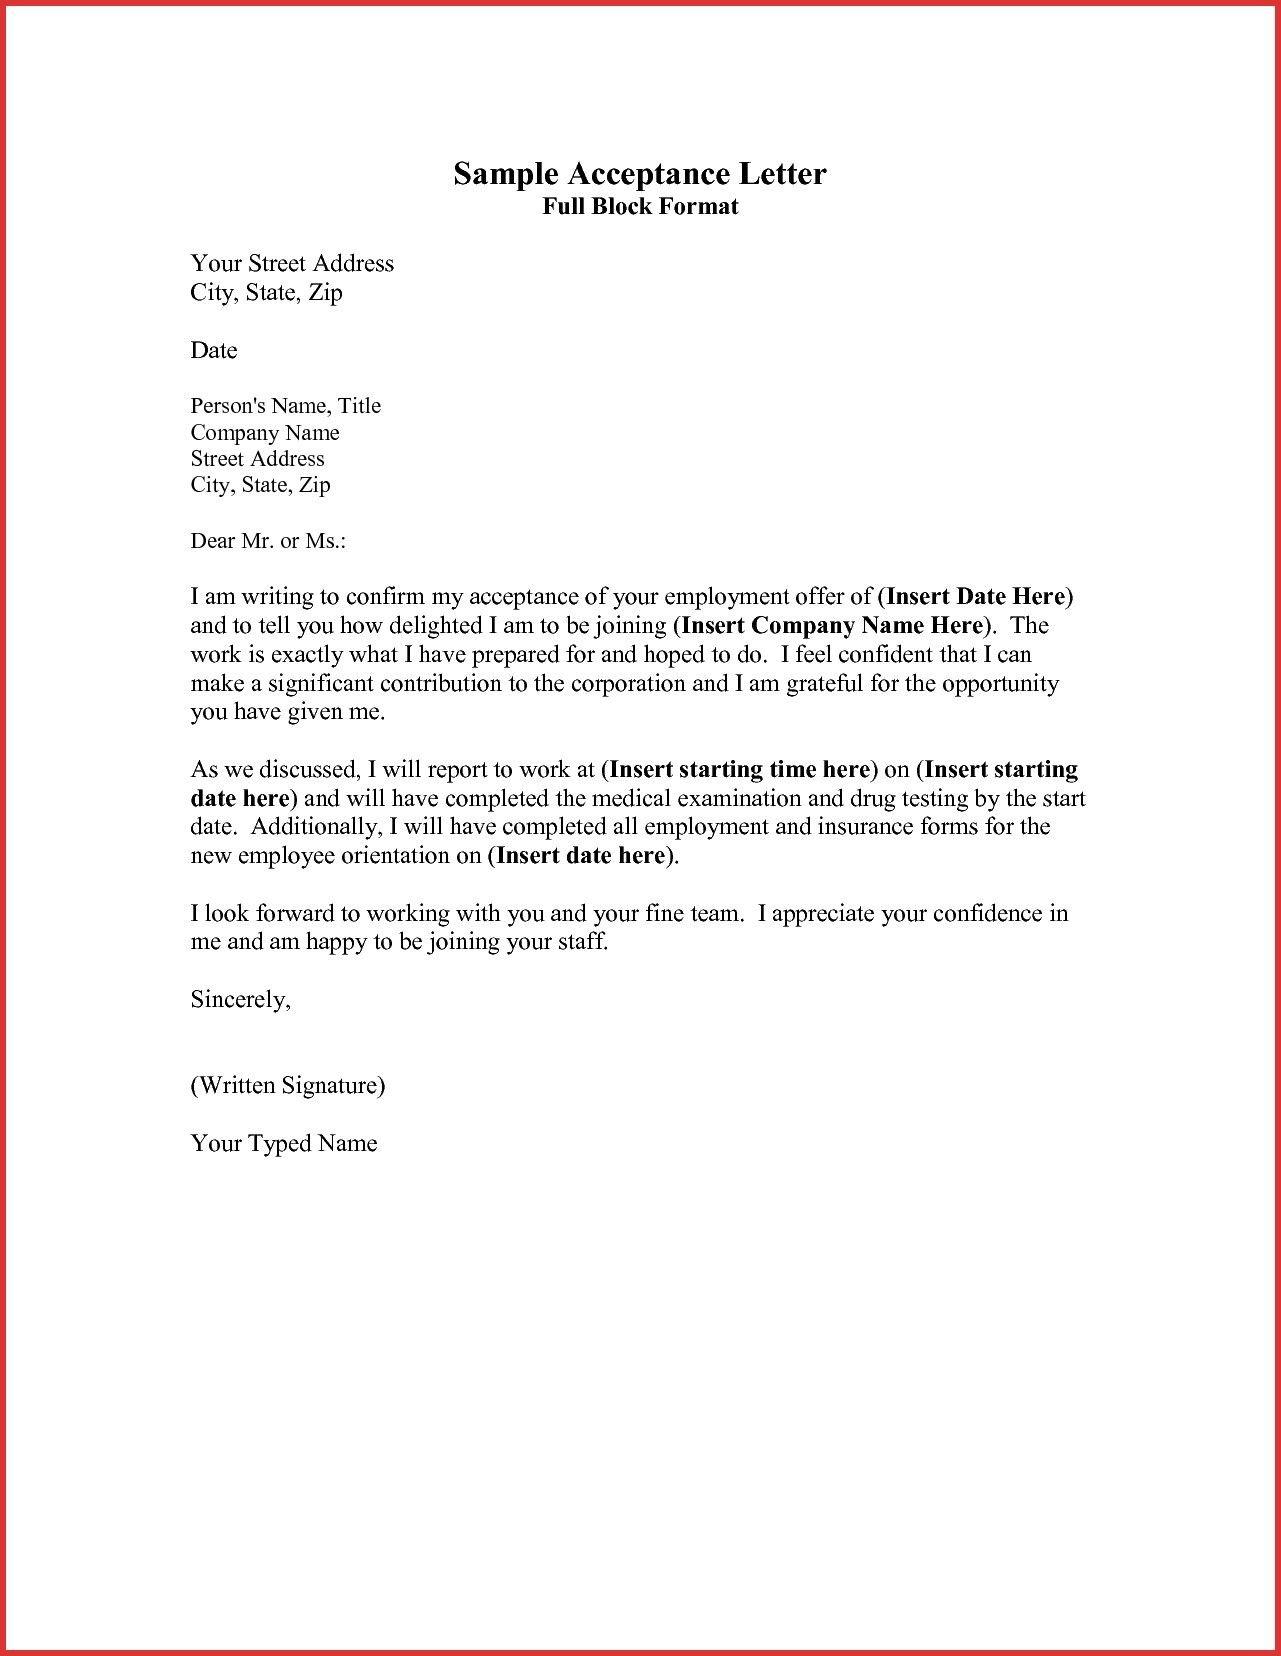 Best Refrence New Sample Letter Full Block Format By Httpwaldwert Visit Detail Http Org Samp Acceptance Lettering Busines Essay